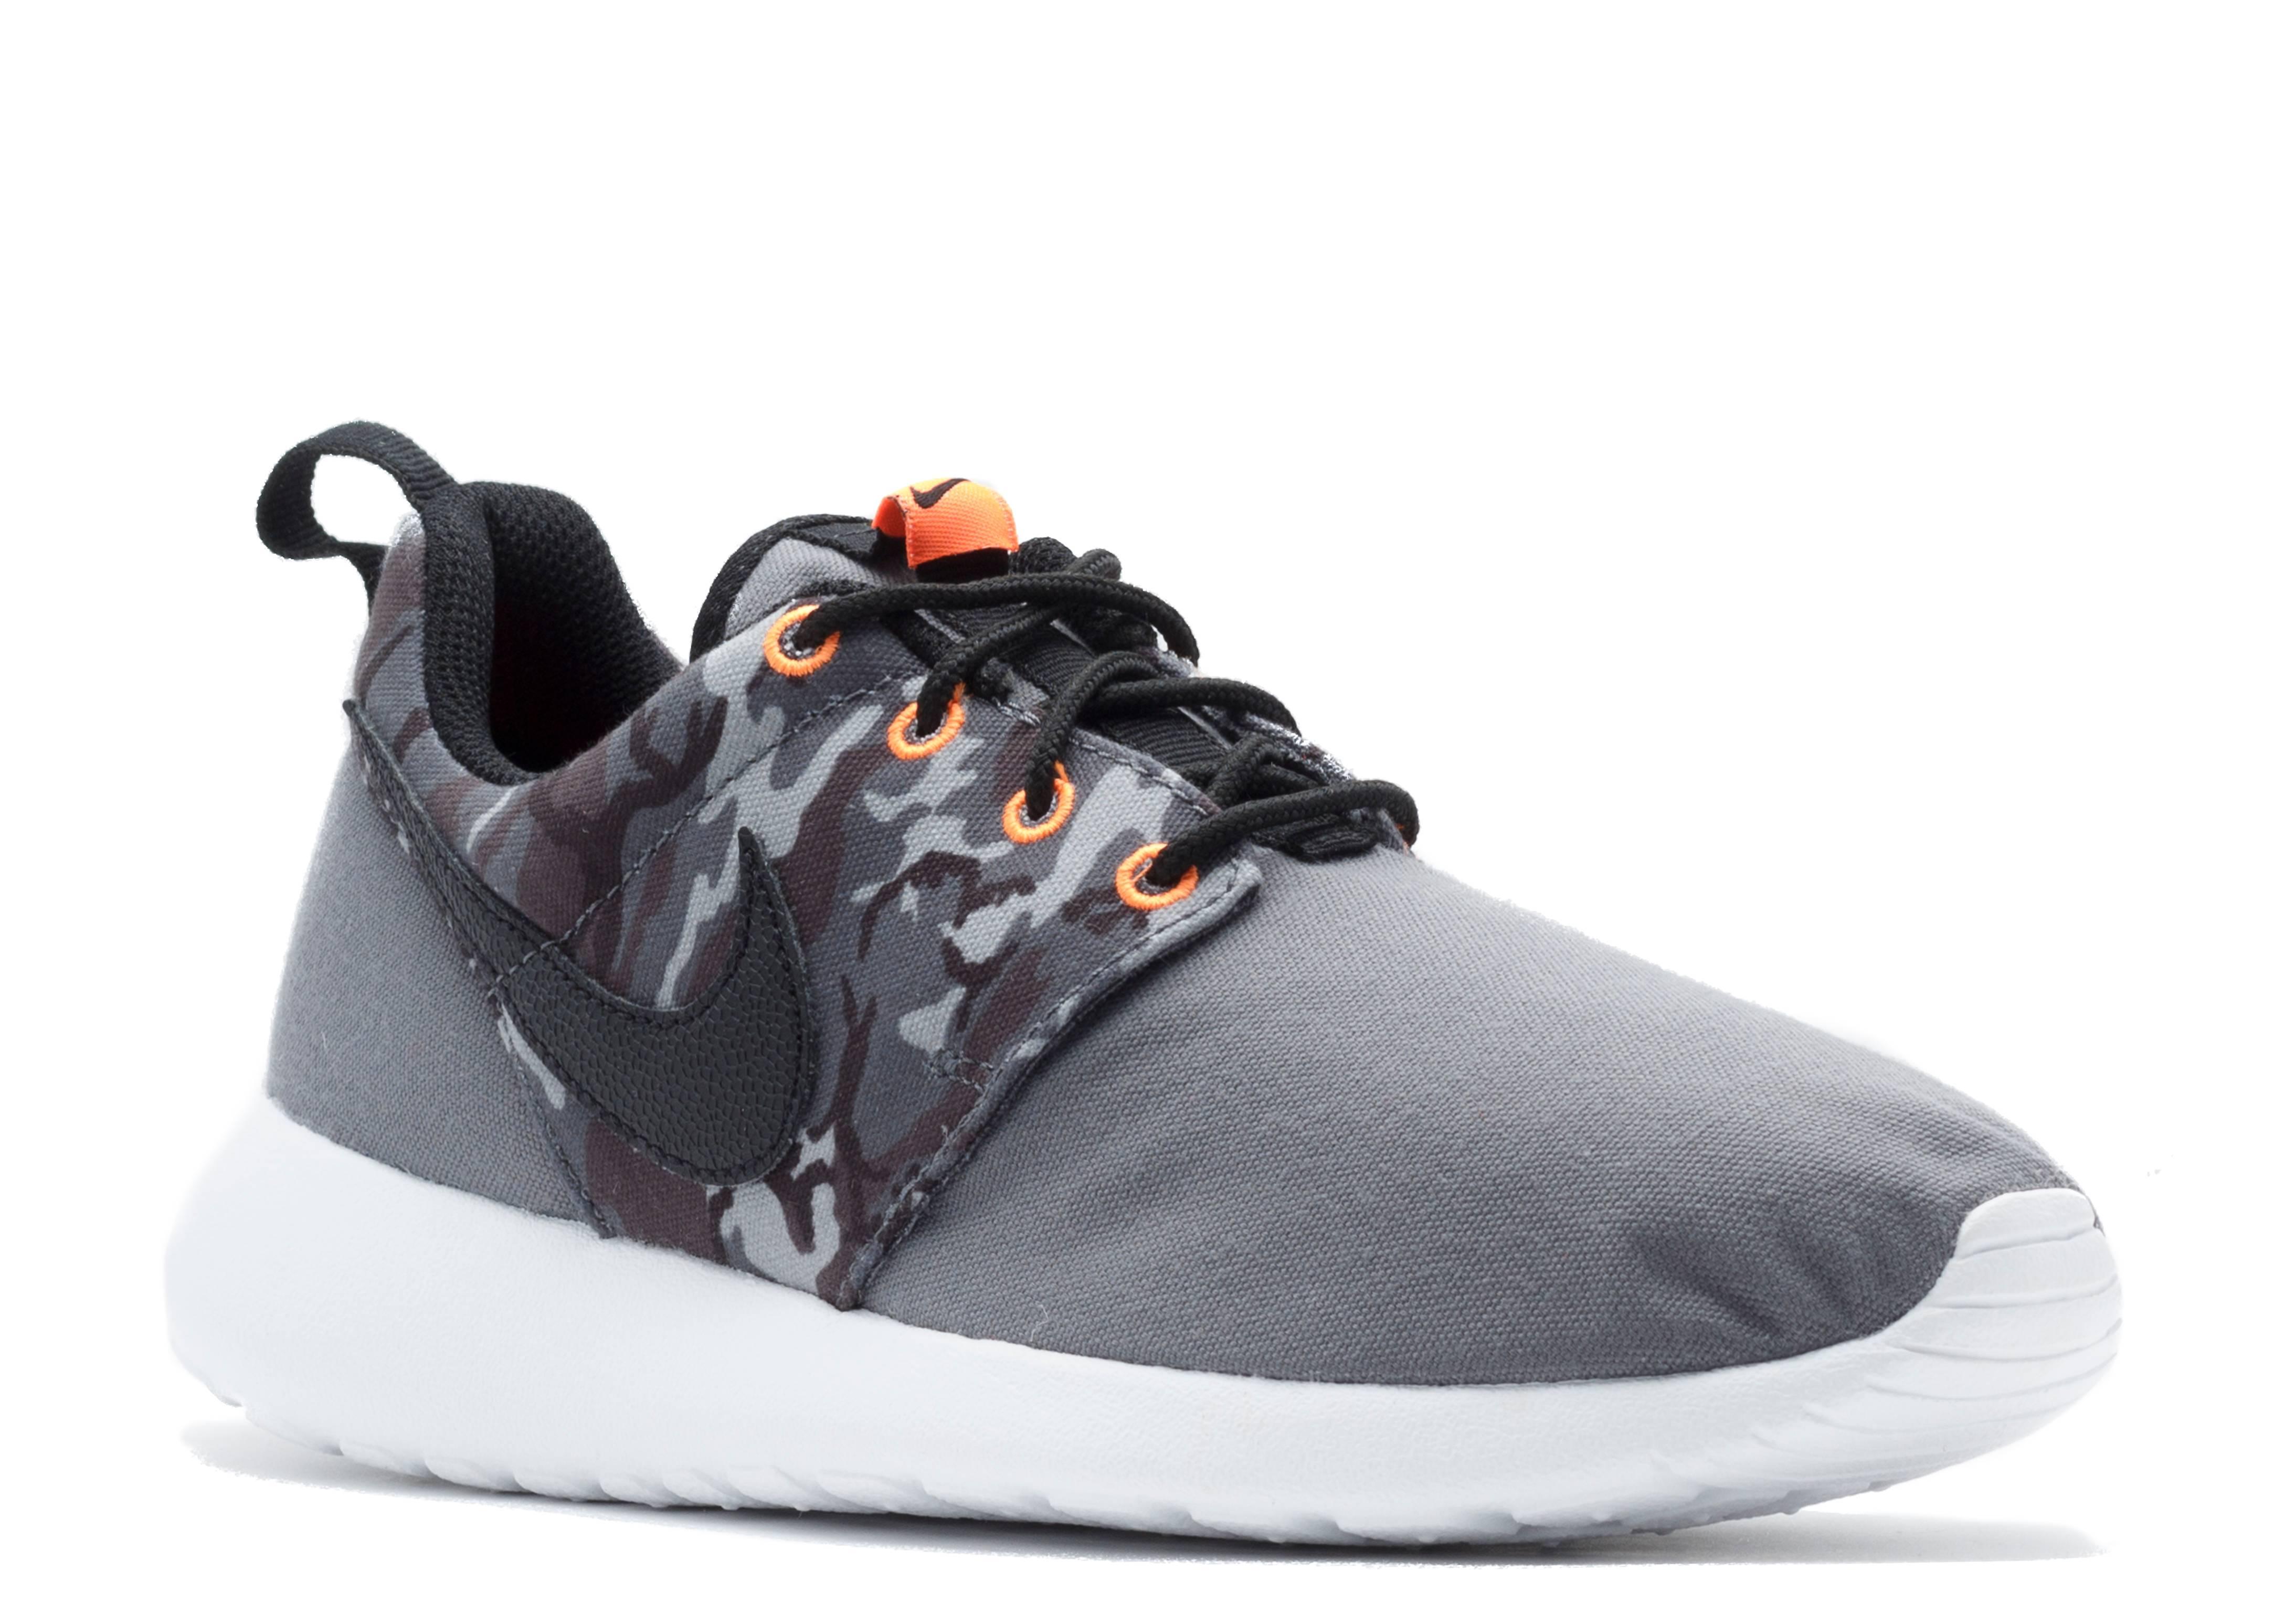 Rosherun Print Gs - Nike - 677782 004 - dark grey black-cl gry ... 206d65806